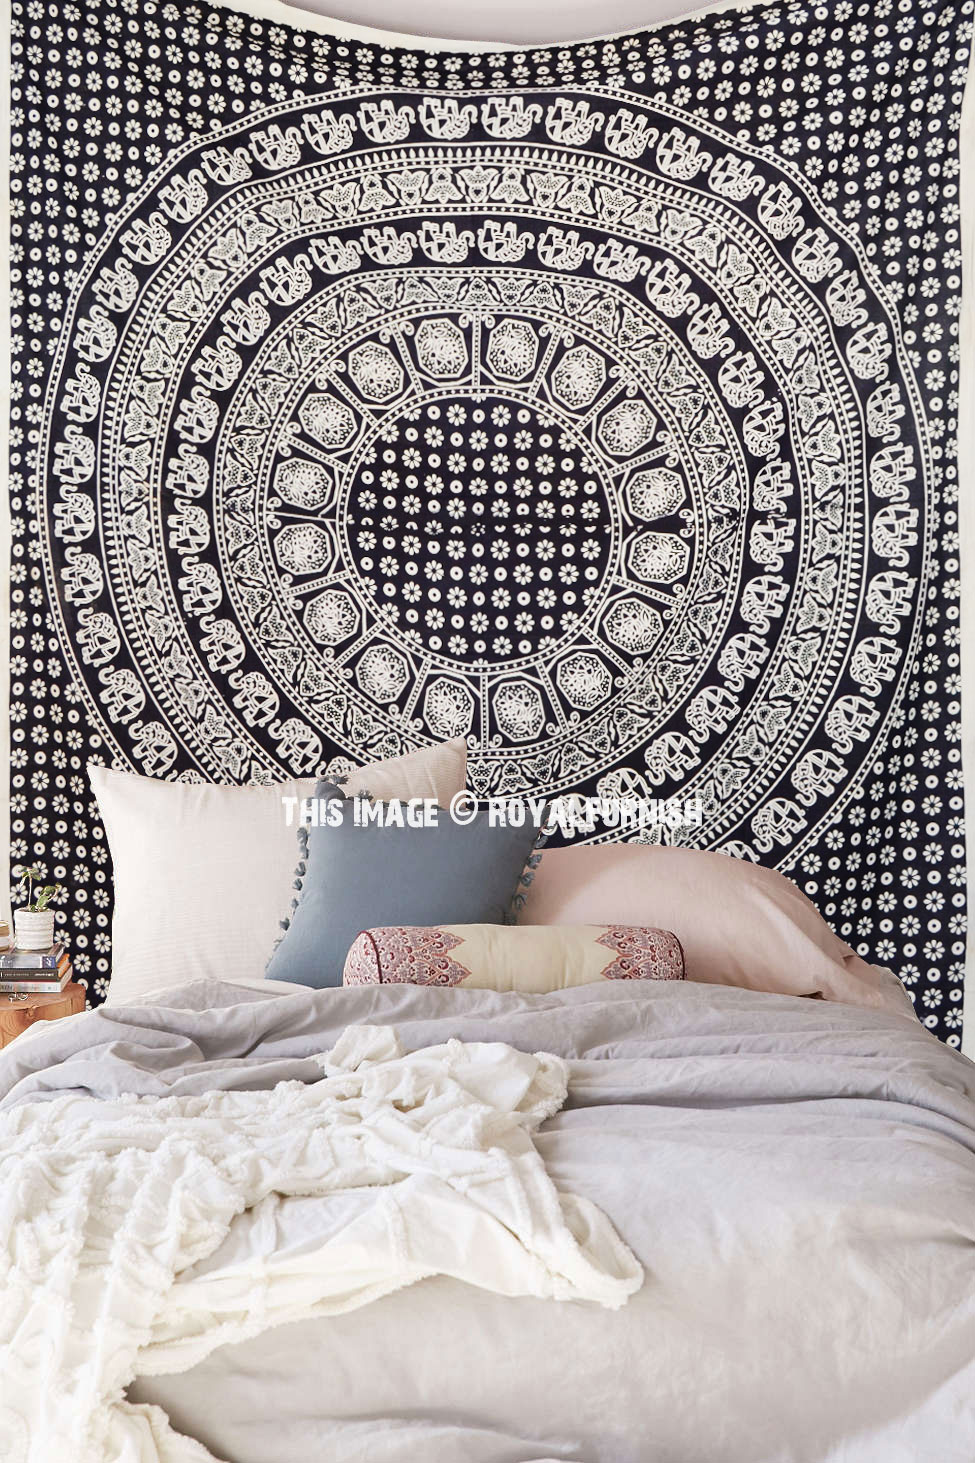 Black And White Multi Elephants Ring Circle Medallion Mandala Tapestry Boho Bedspread Royalfurnish Com